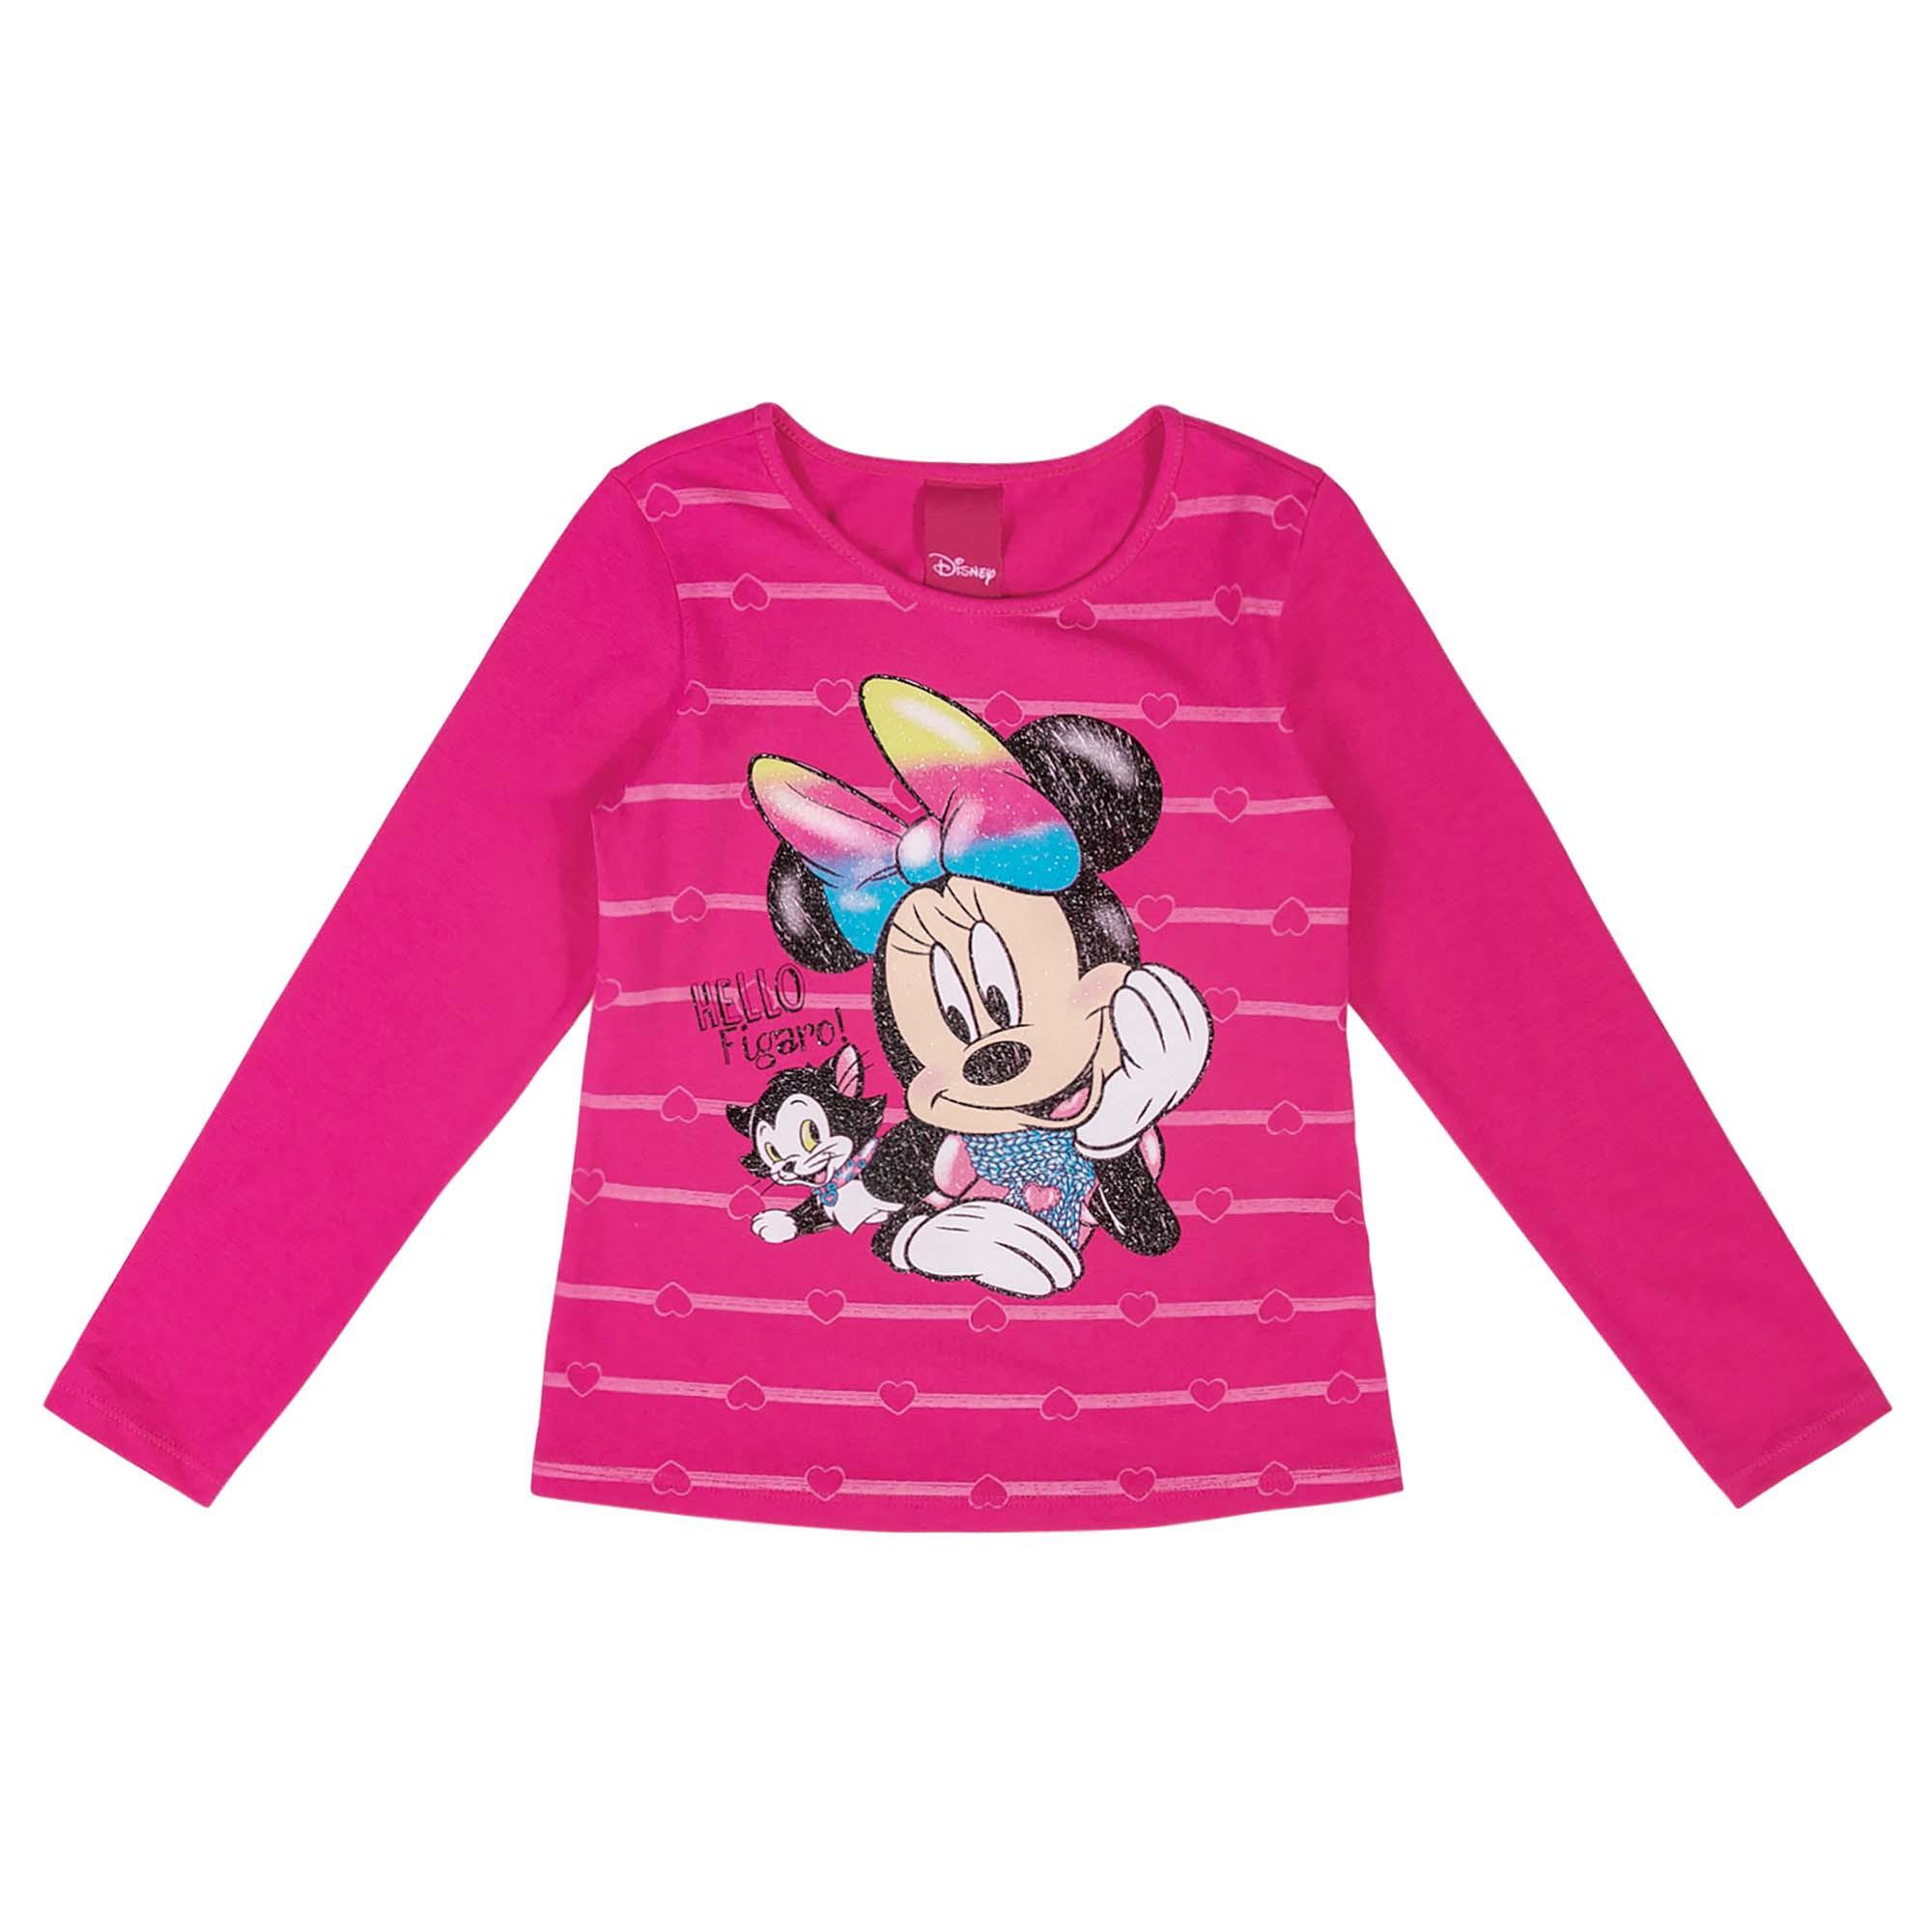 Blusa Manga Longa Cativa Estampa Listras e Glitter Minnie e Gata Hello Figaro! - 6 ao 10